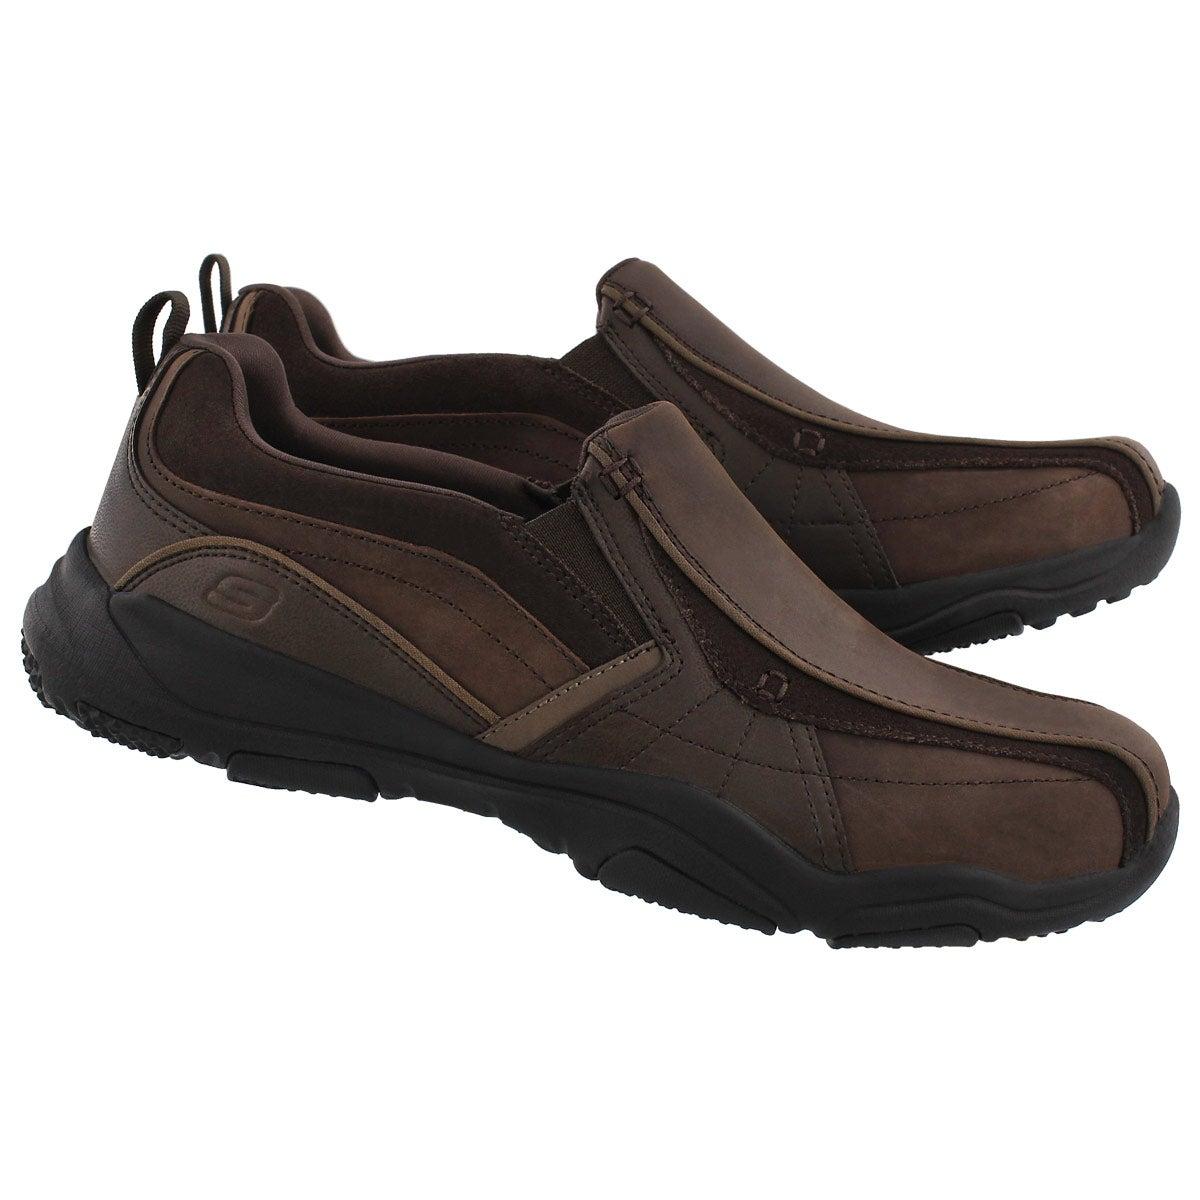 Mns Larson Berto dk brown slip on shoe